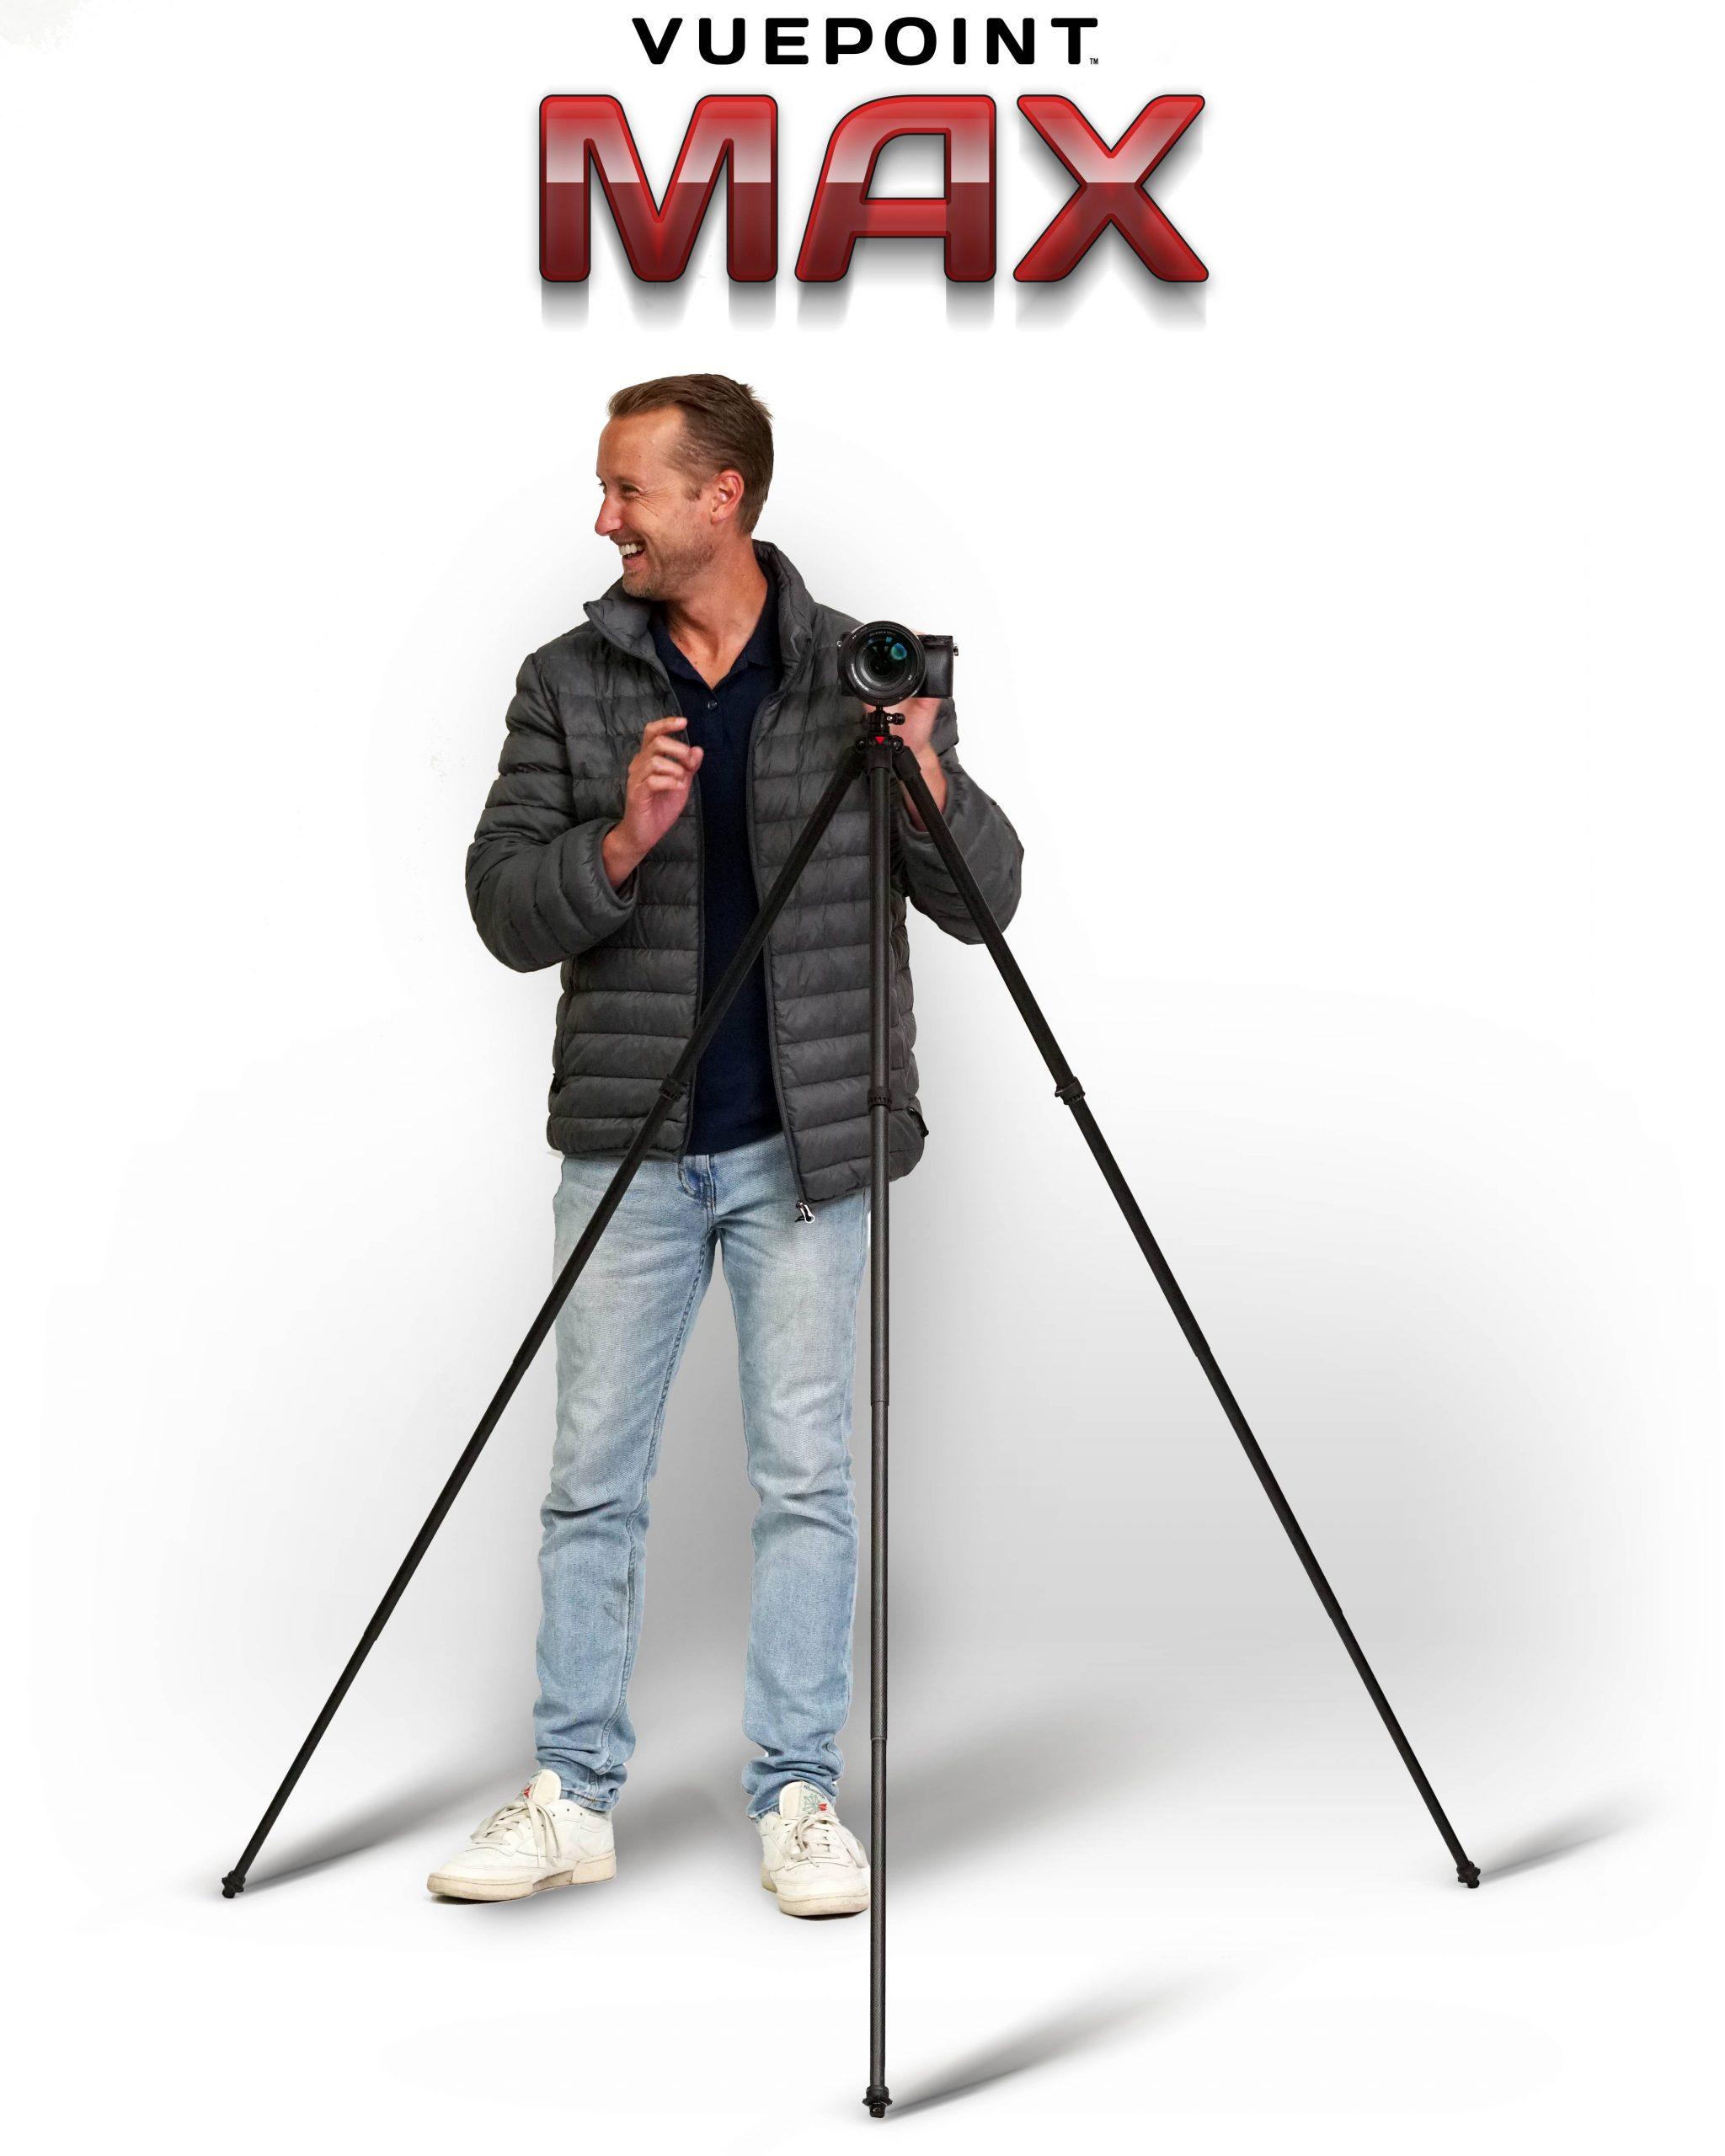 VuePoint Max Ultralight Tripod